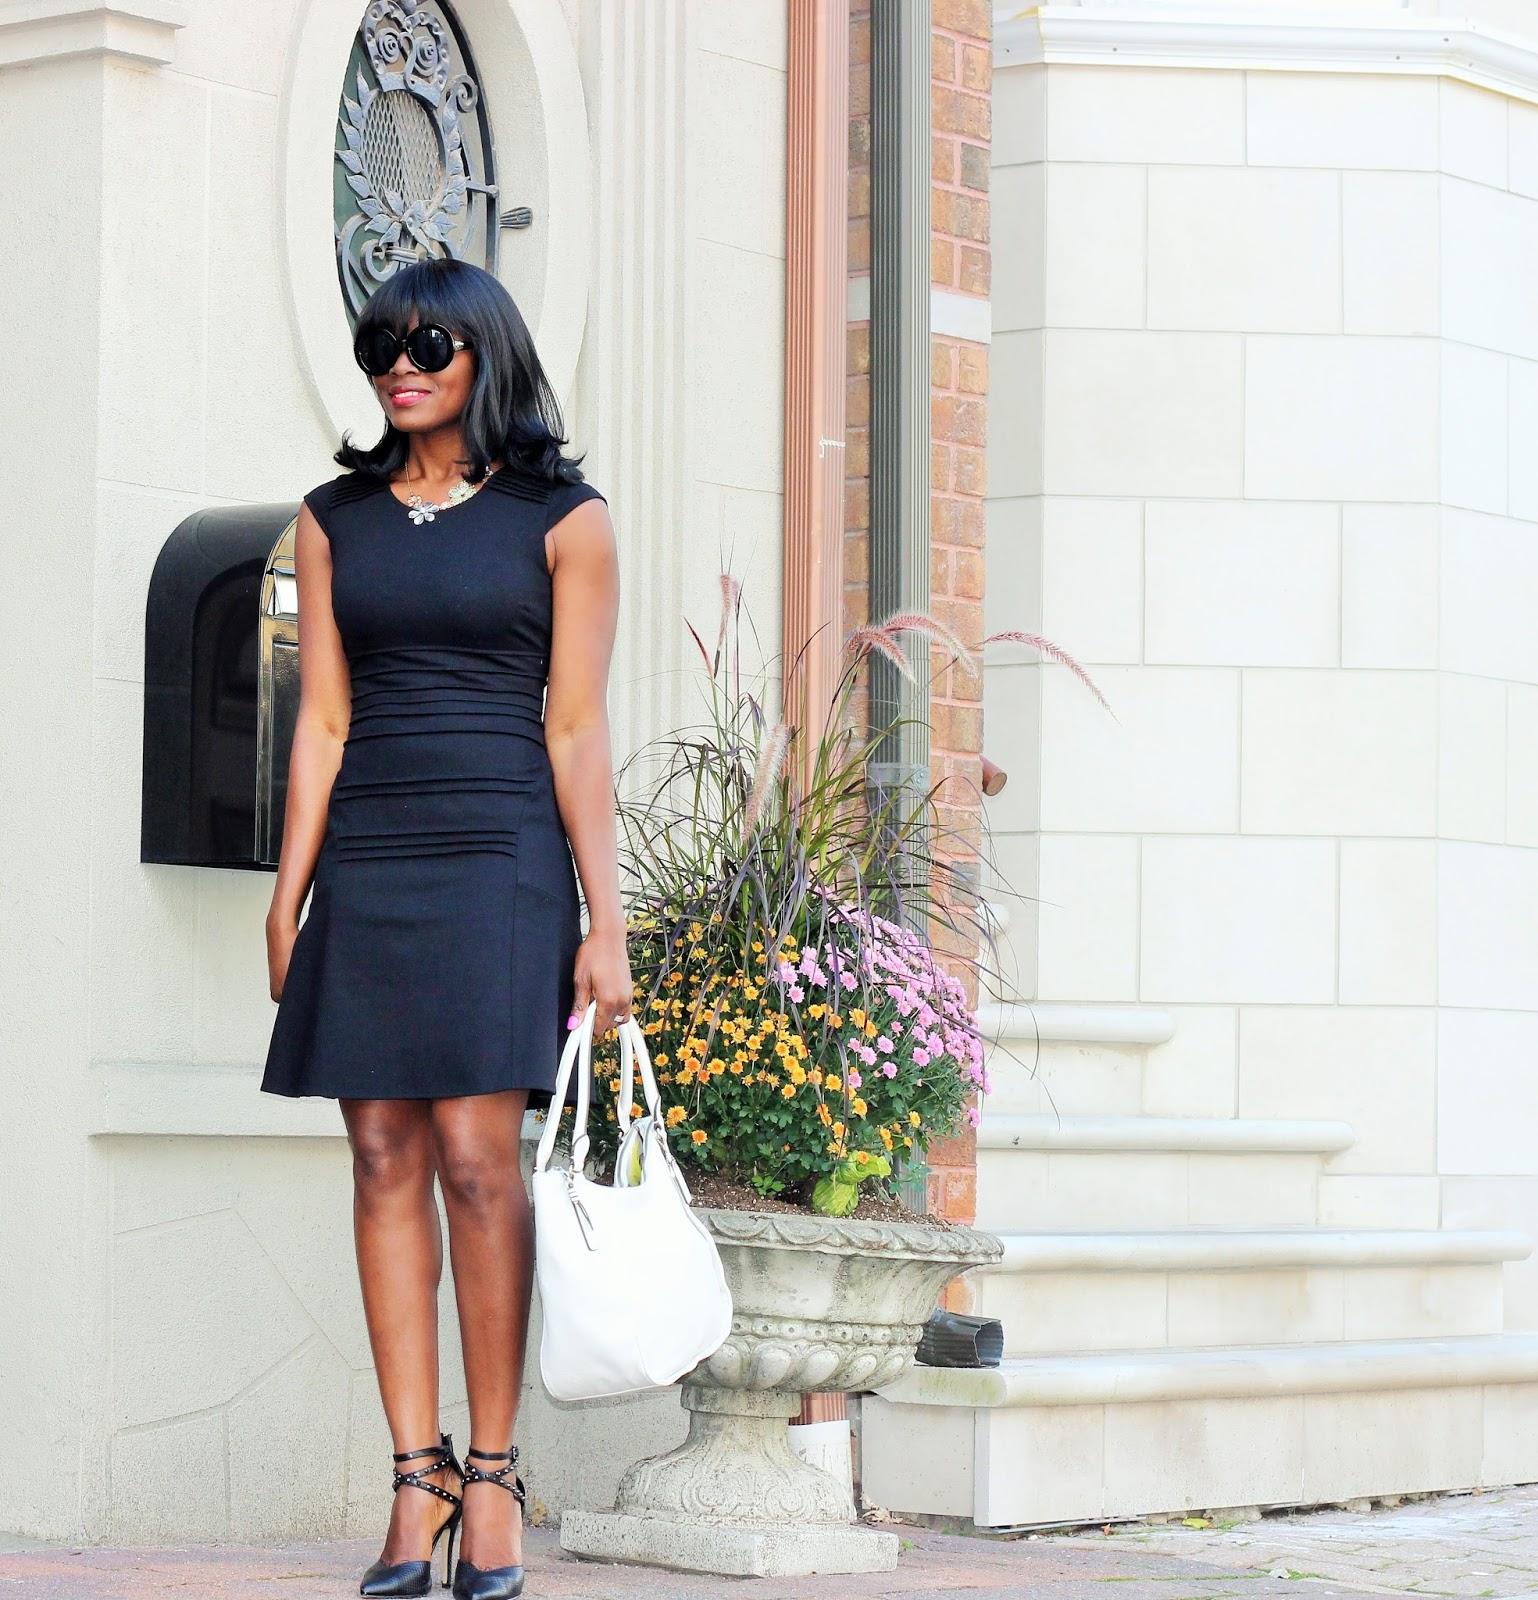 Classic Black Dress by Jennifer Lopez